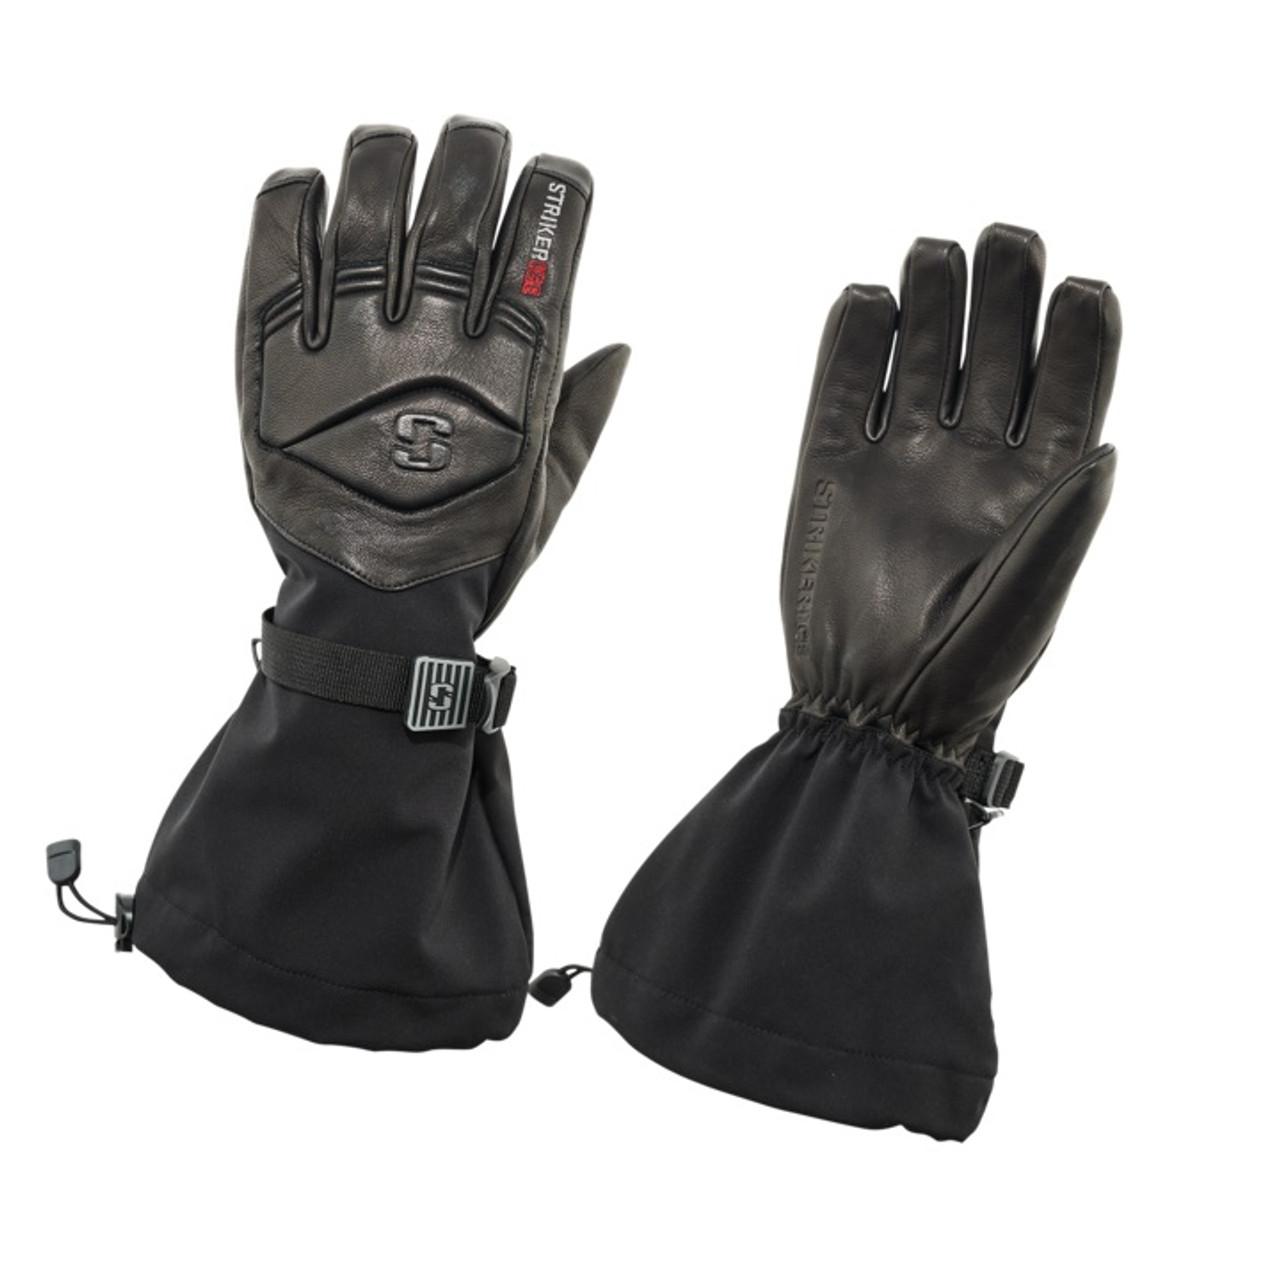 Striker Ice Combat Leather Ice Fishing Gloves